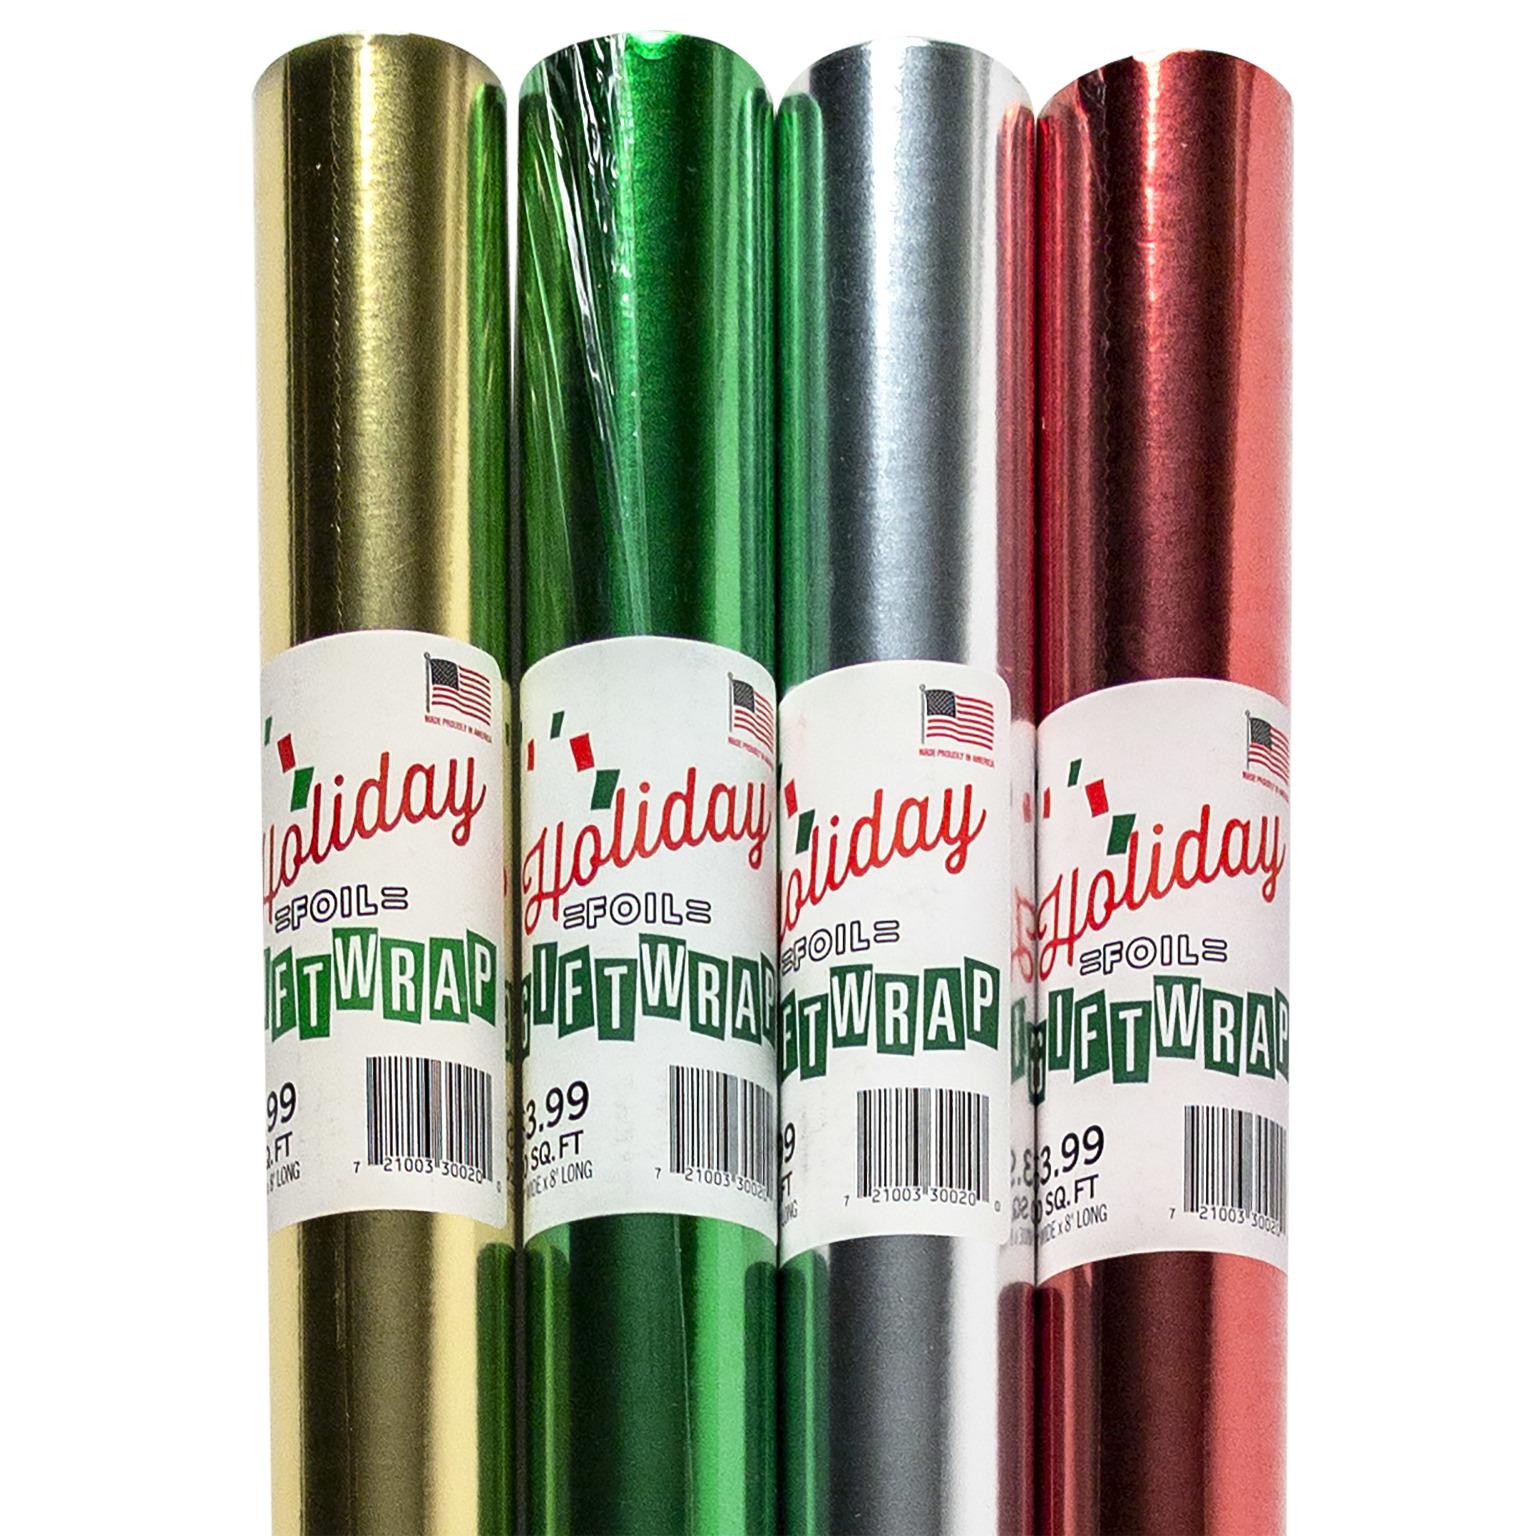 ''CHRISTMAS Foil Gift Wrap - 20f ft. x 30'''' [1869975]''